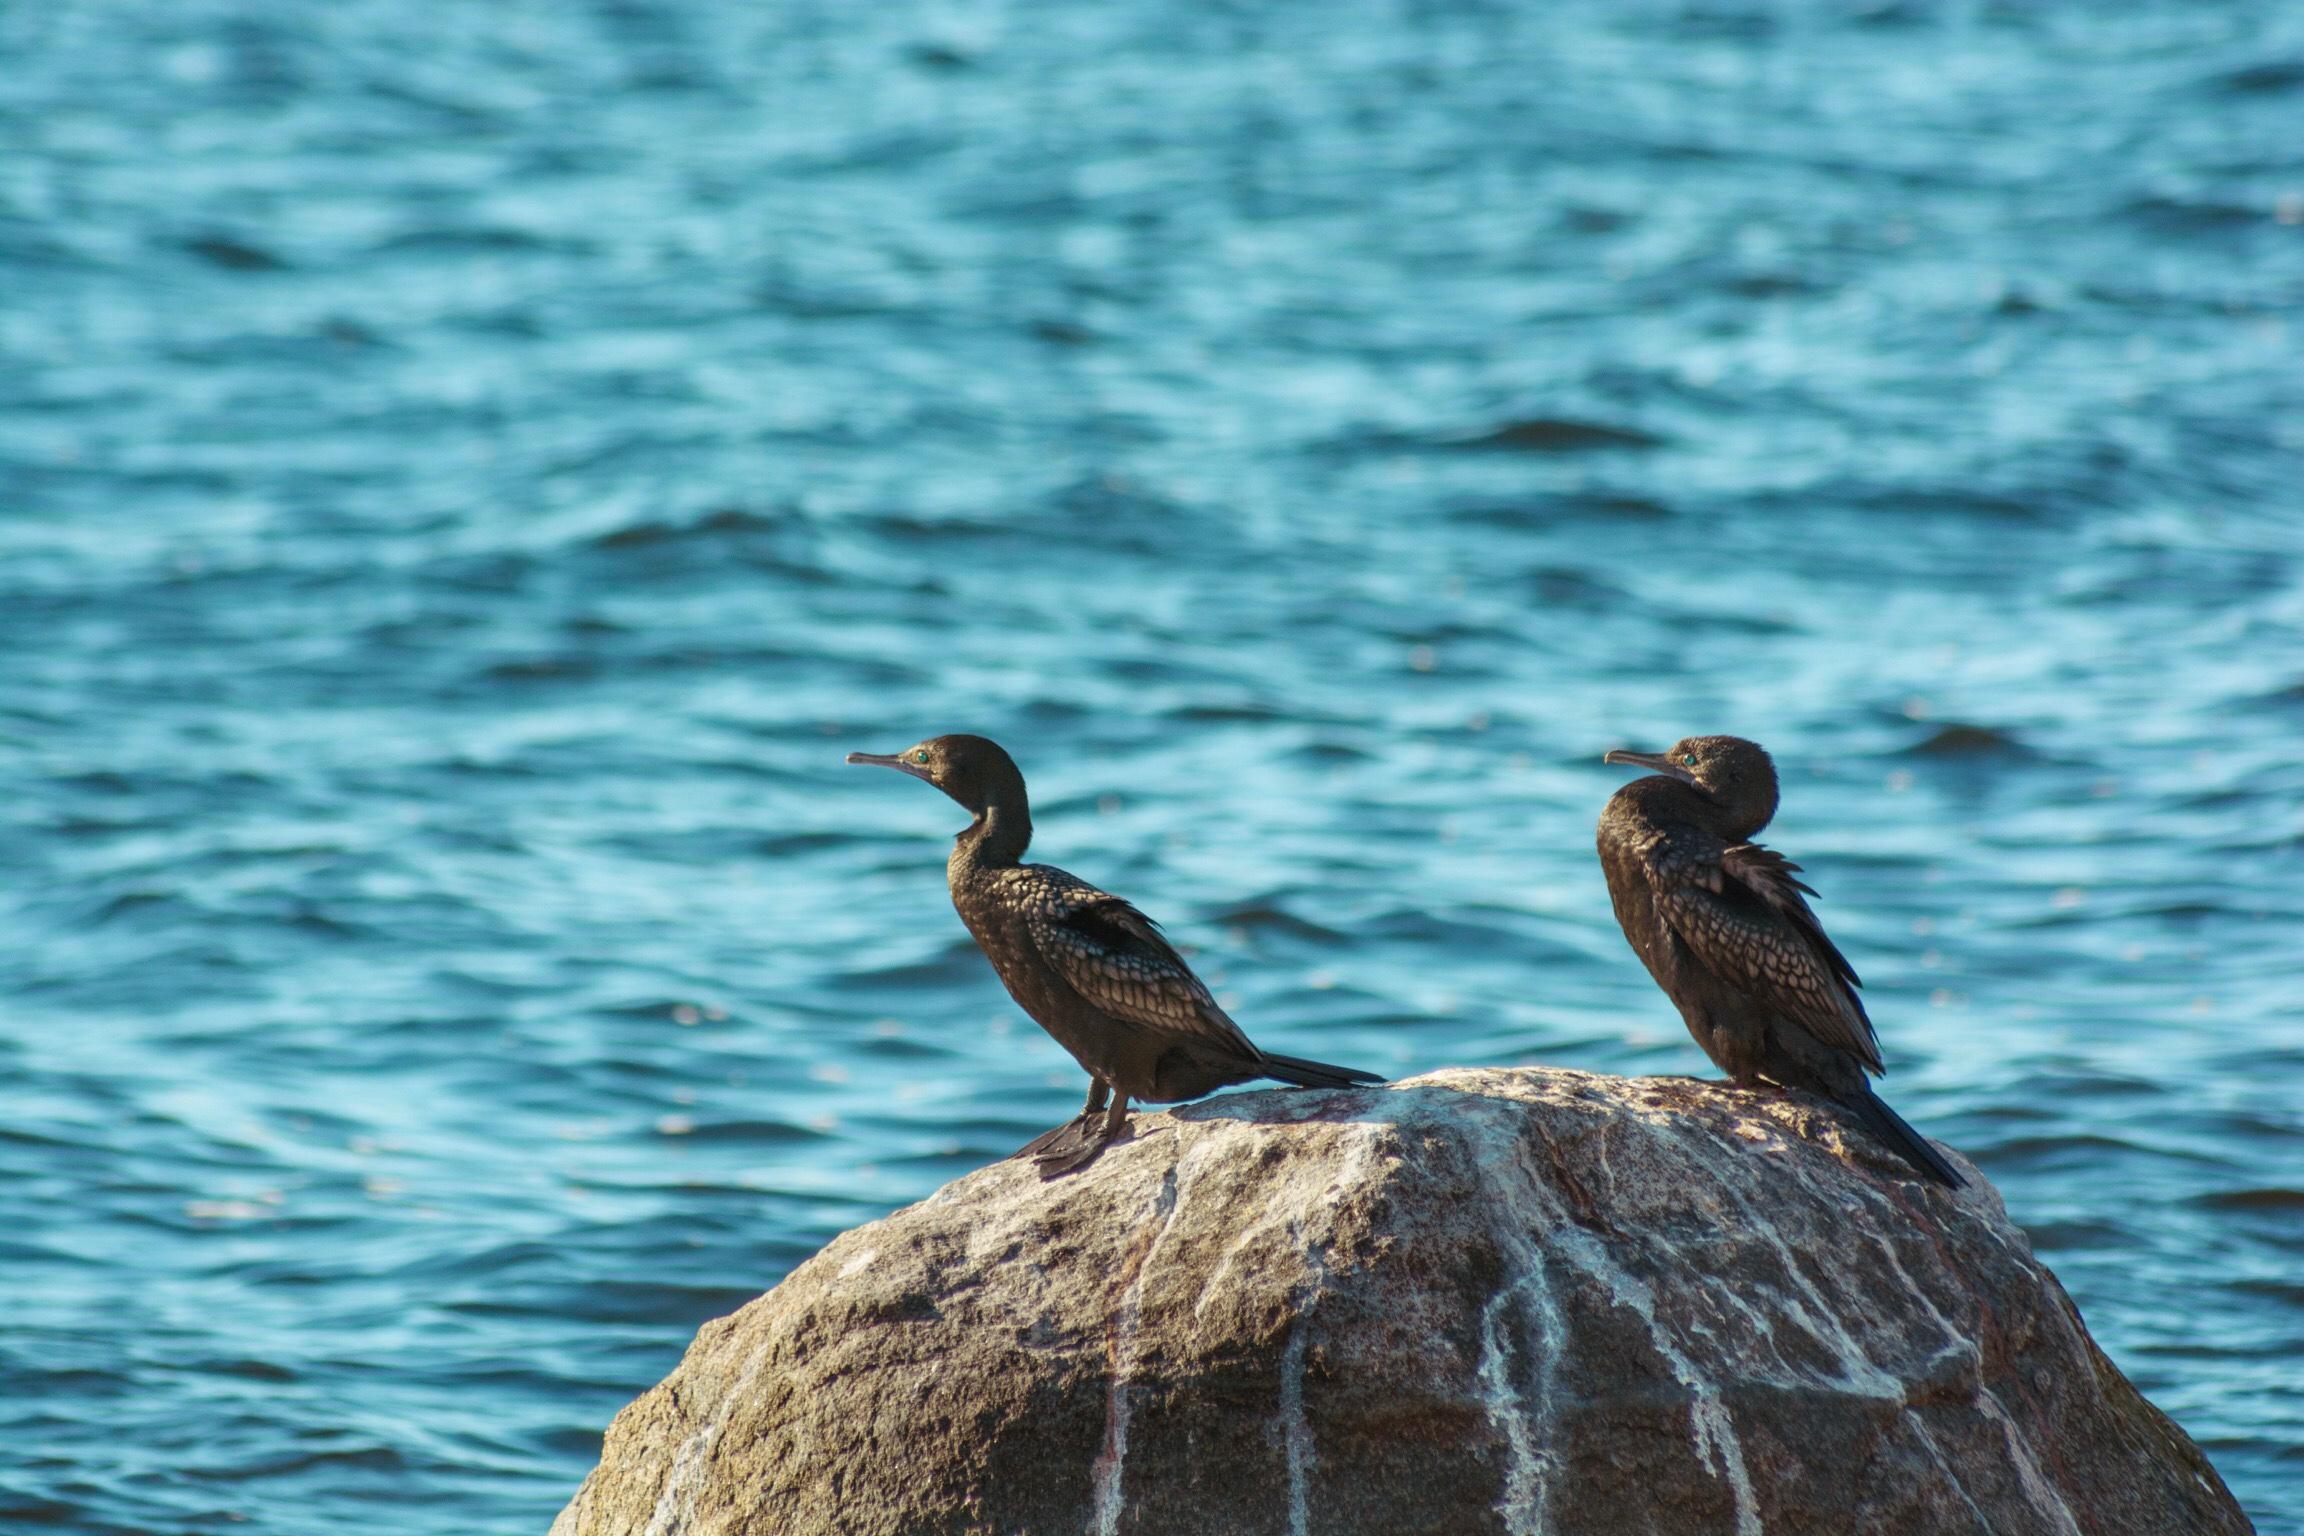 Phalacrocorax sulcirostris | Sandy Bay, Hobart | D7100 | (2019)